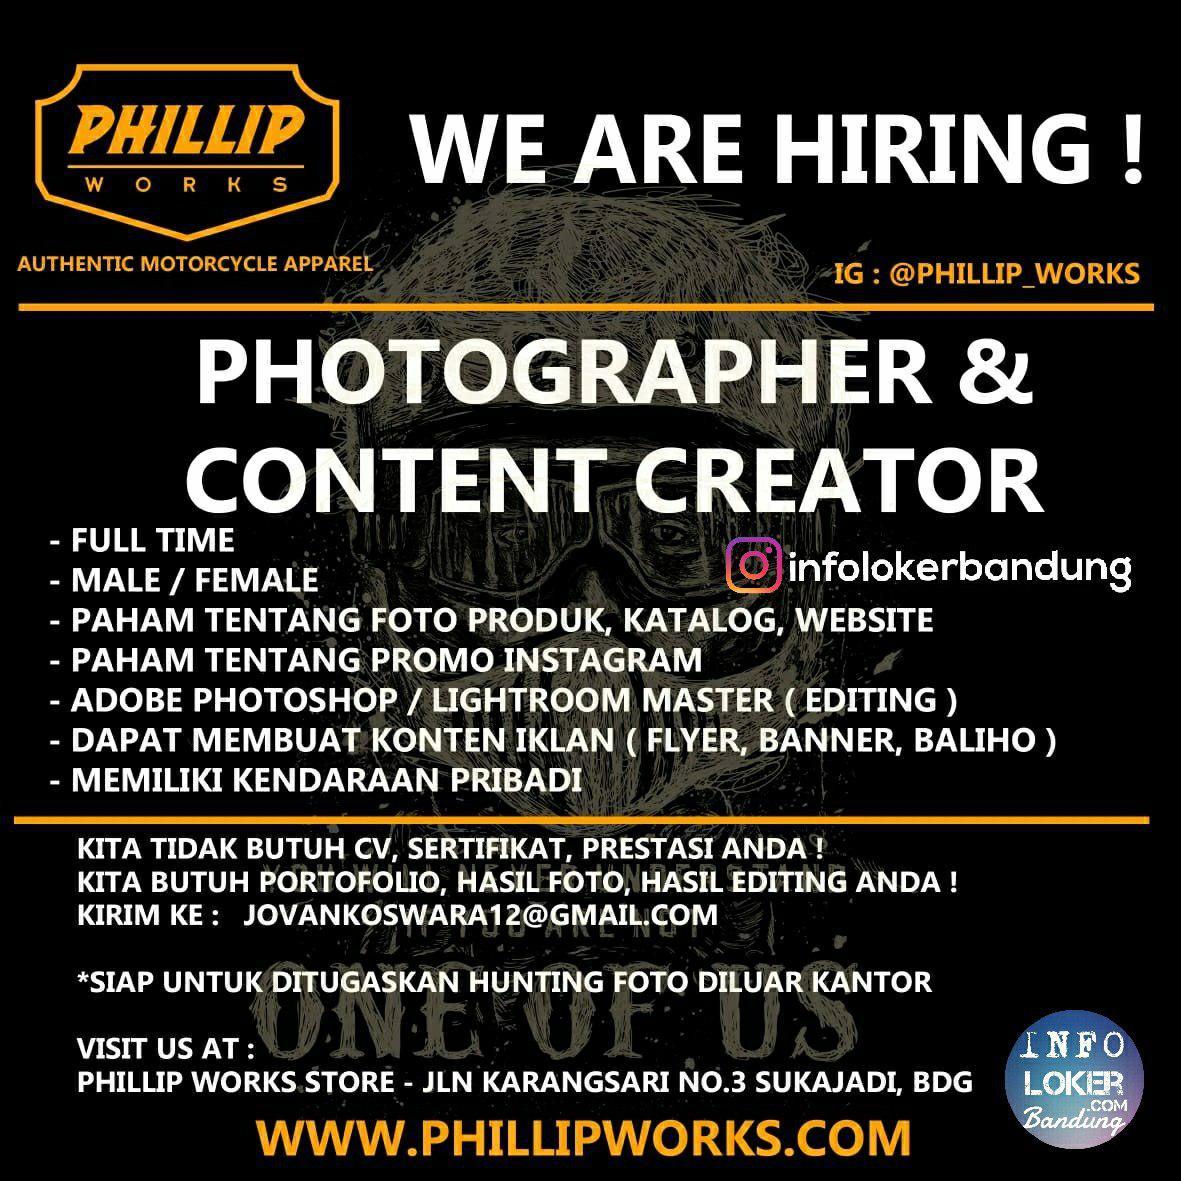 Lowongan Kerja Photographer & Content Creator Phillip Works Bandung